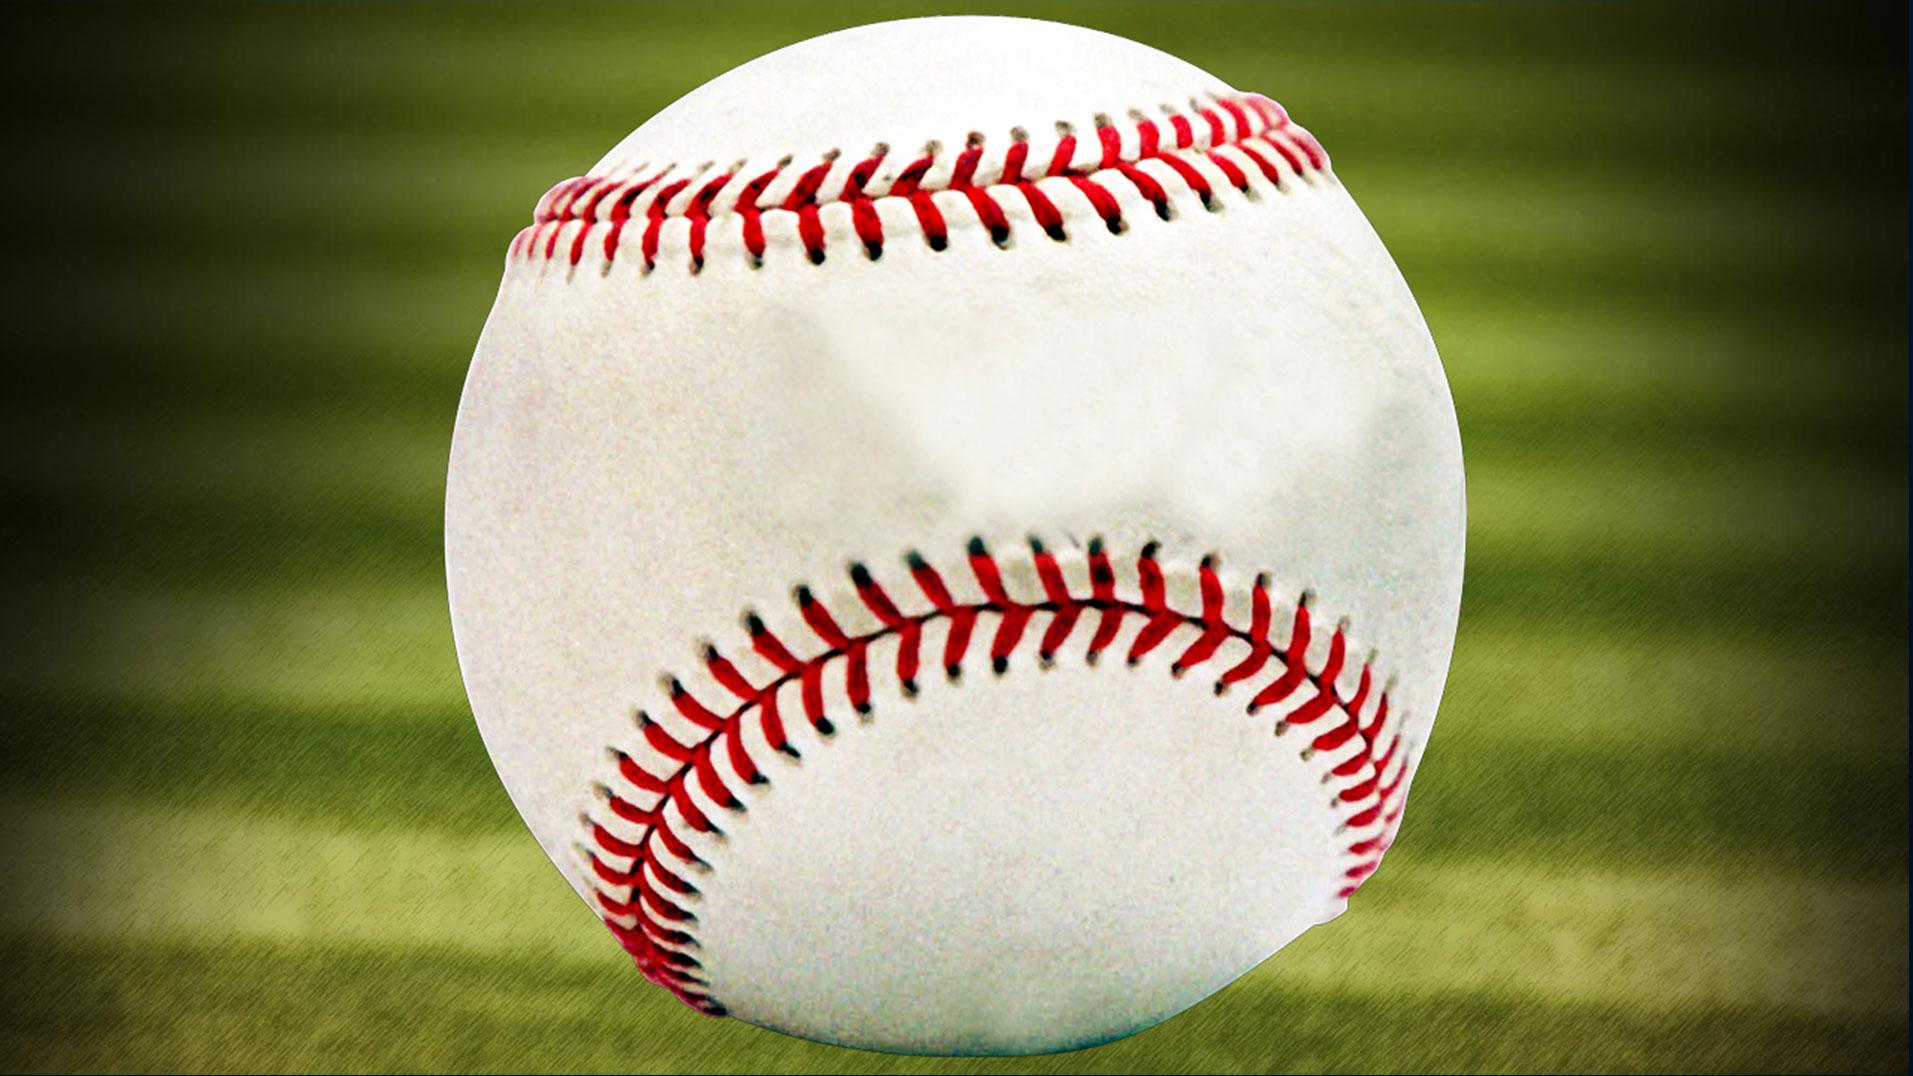 KELO-sports-generic-baseball_1529437977470.jpg